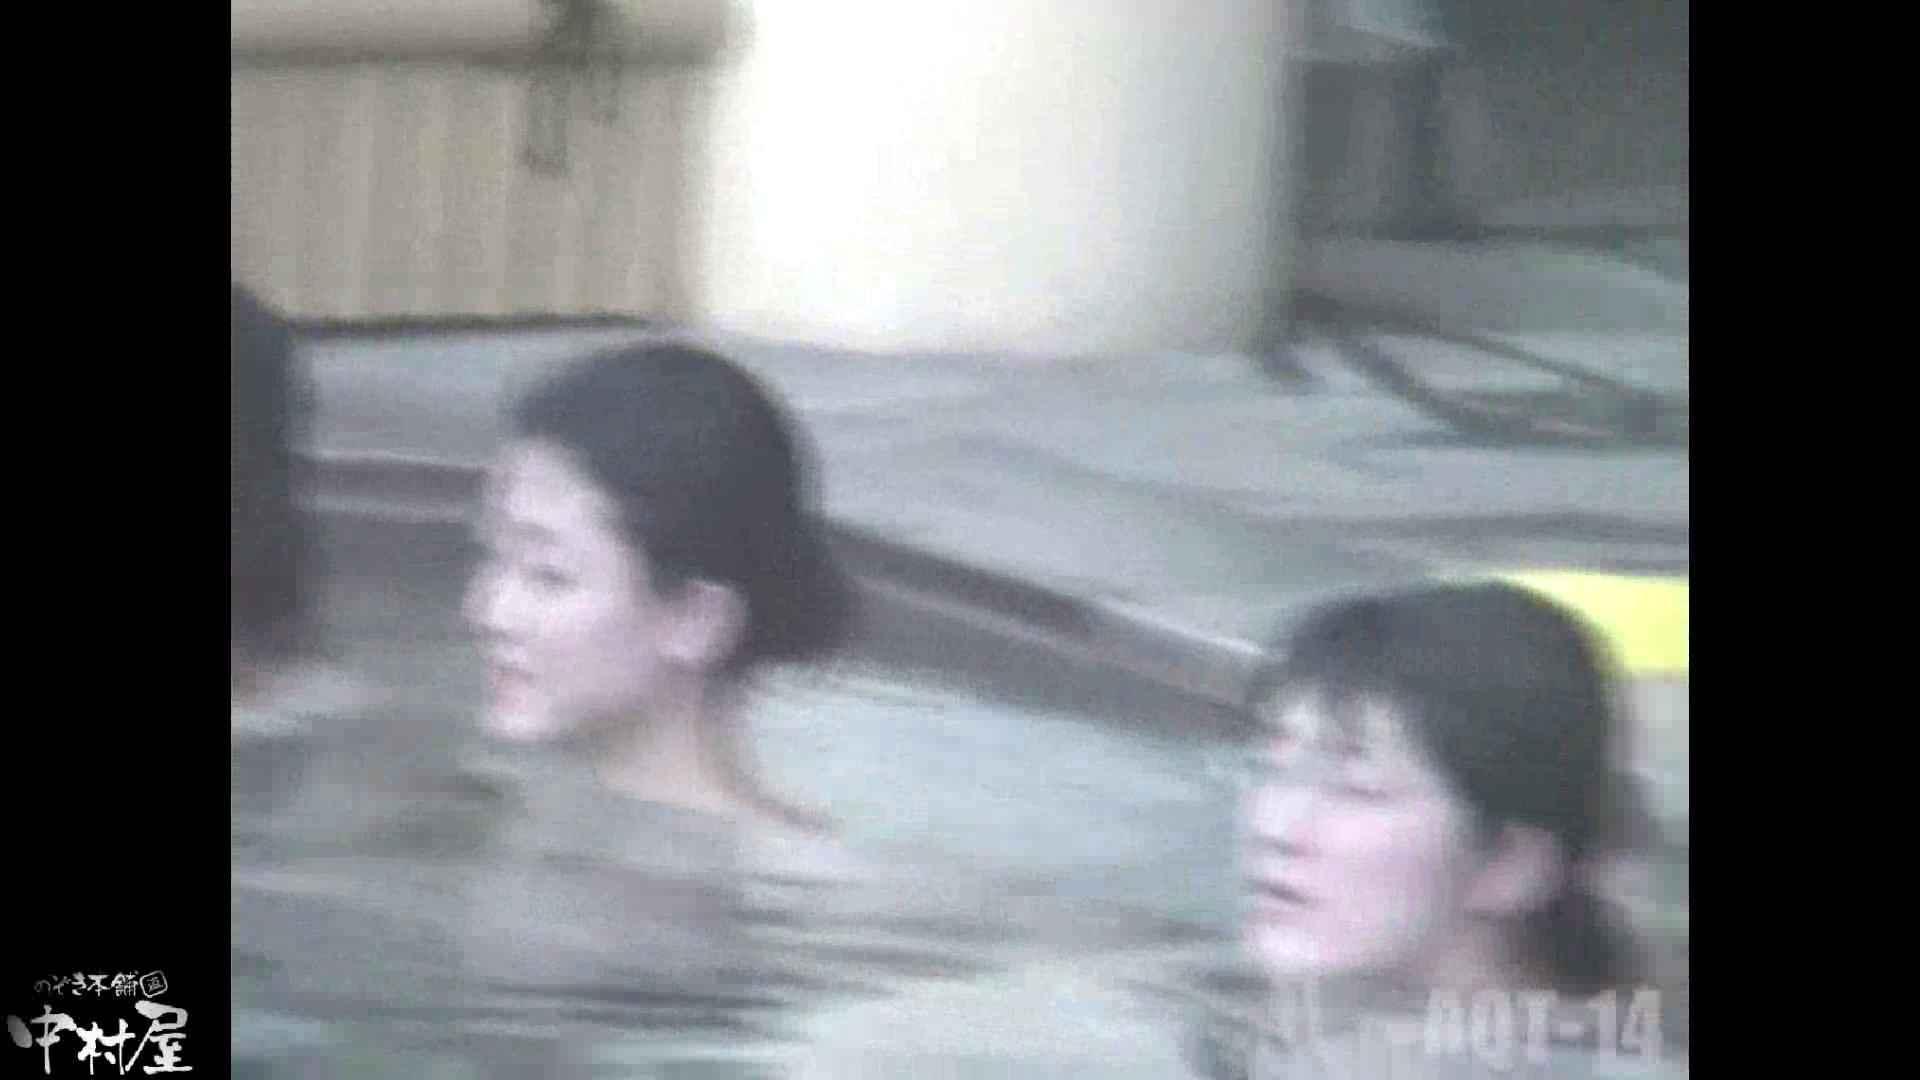 Aquaな露天風呂Vol.878潜入盗撮露天風呂十四判湯 其の十 盗撮  97画像 20